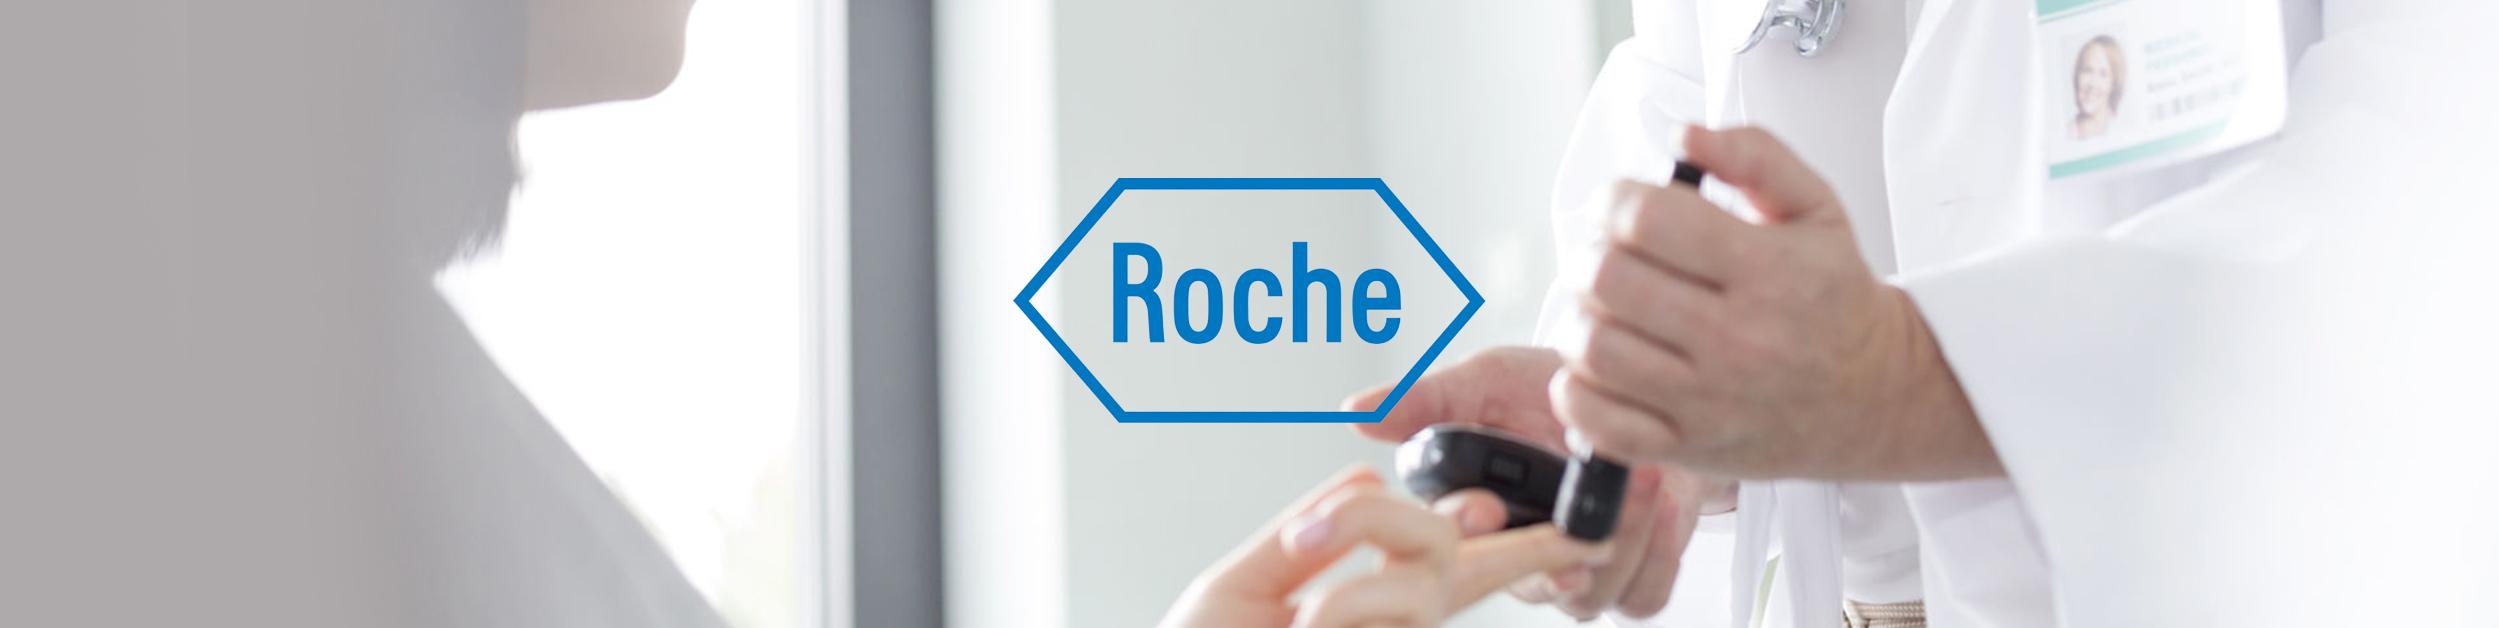 https://agence-ultramedia.com/Roche%20Diabetes%20Care%20repense%20sa%20communication%20interne